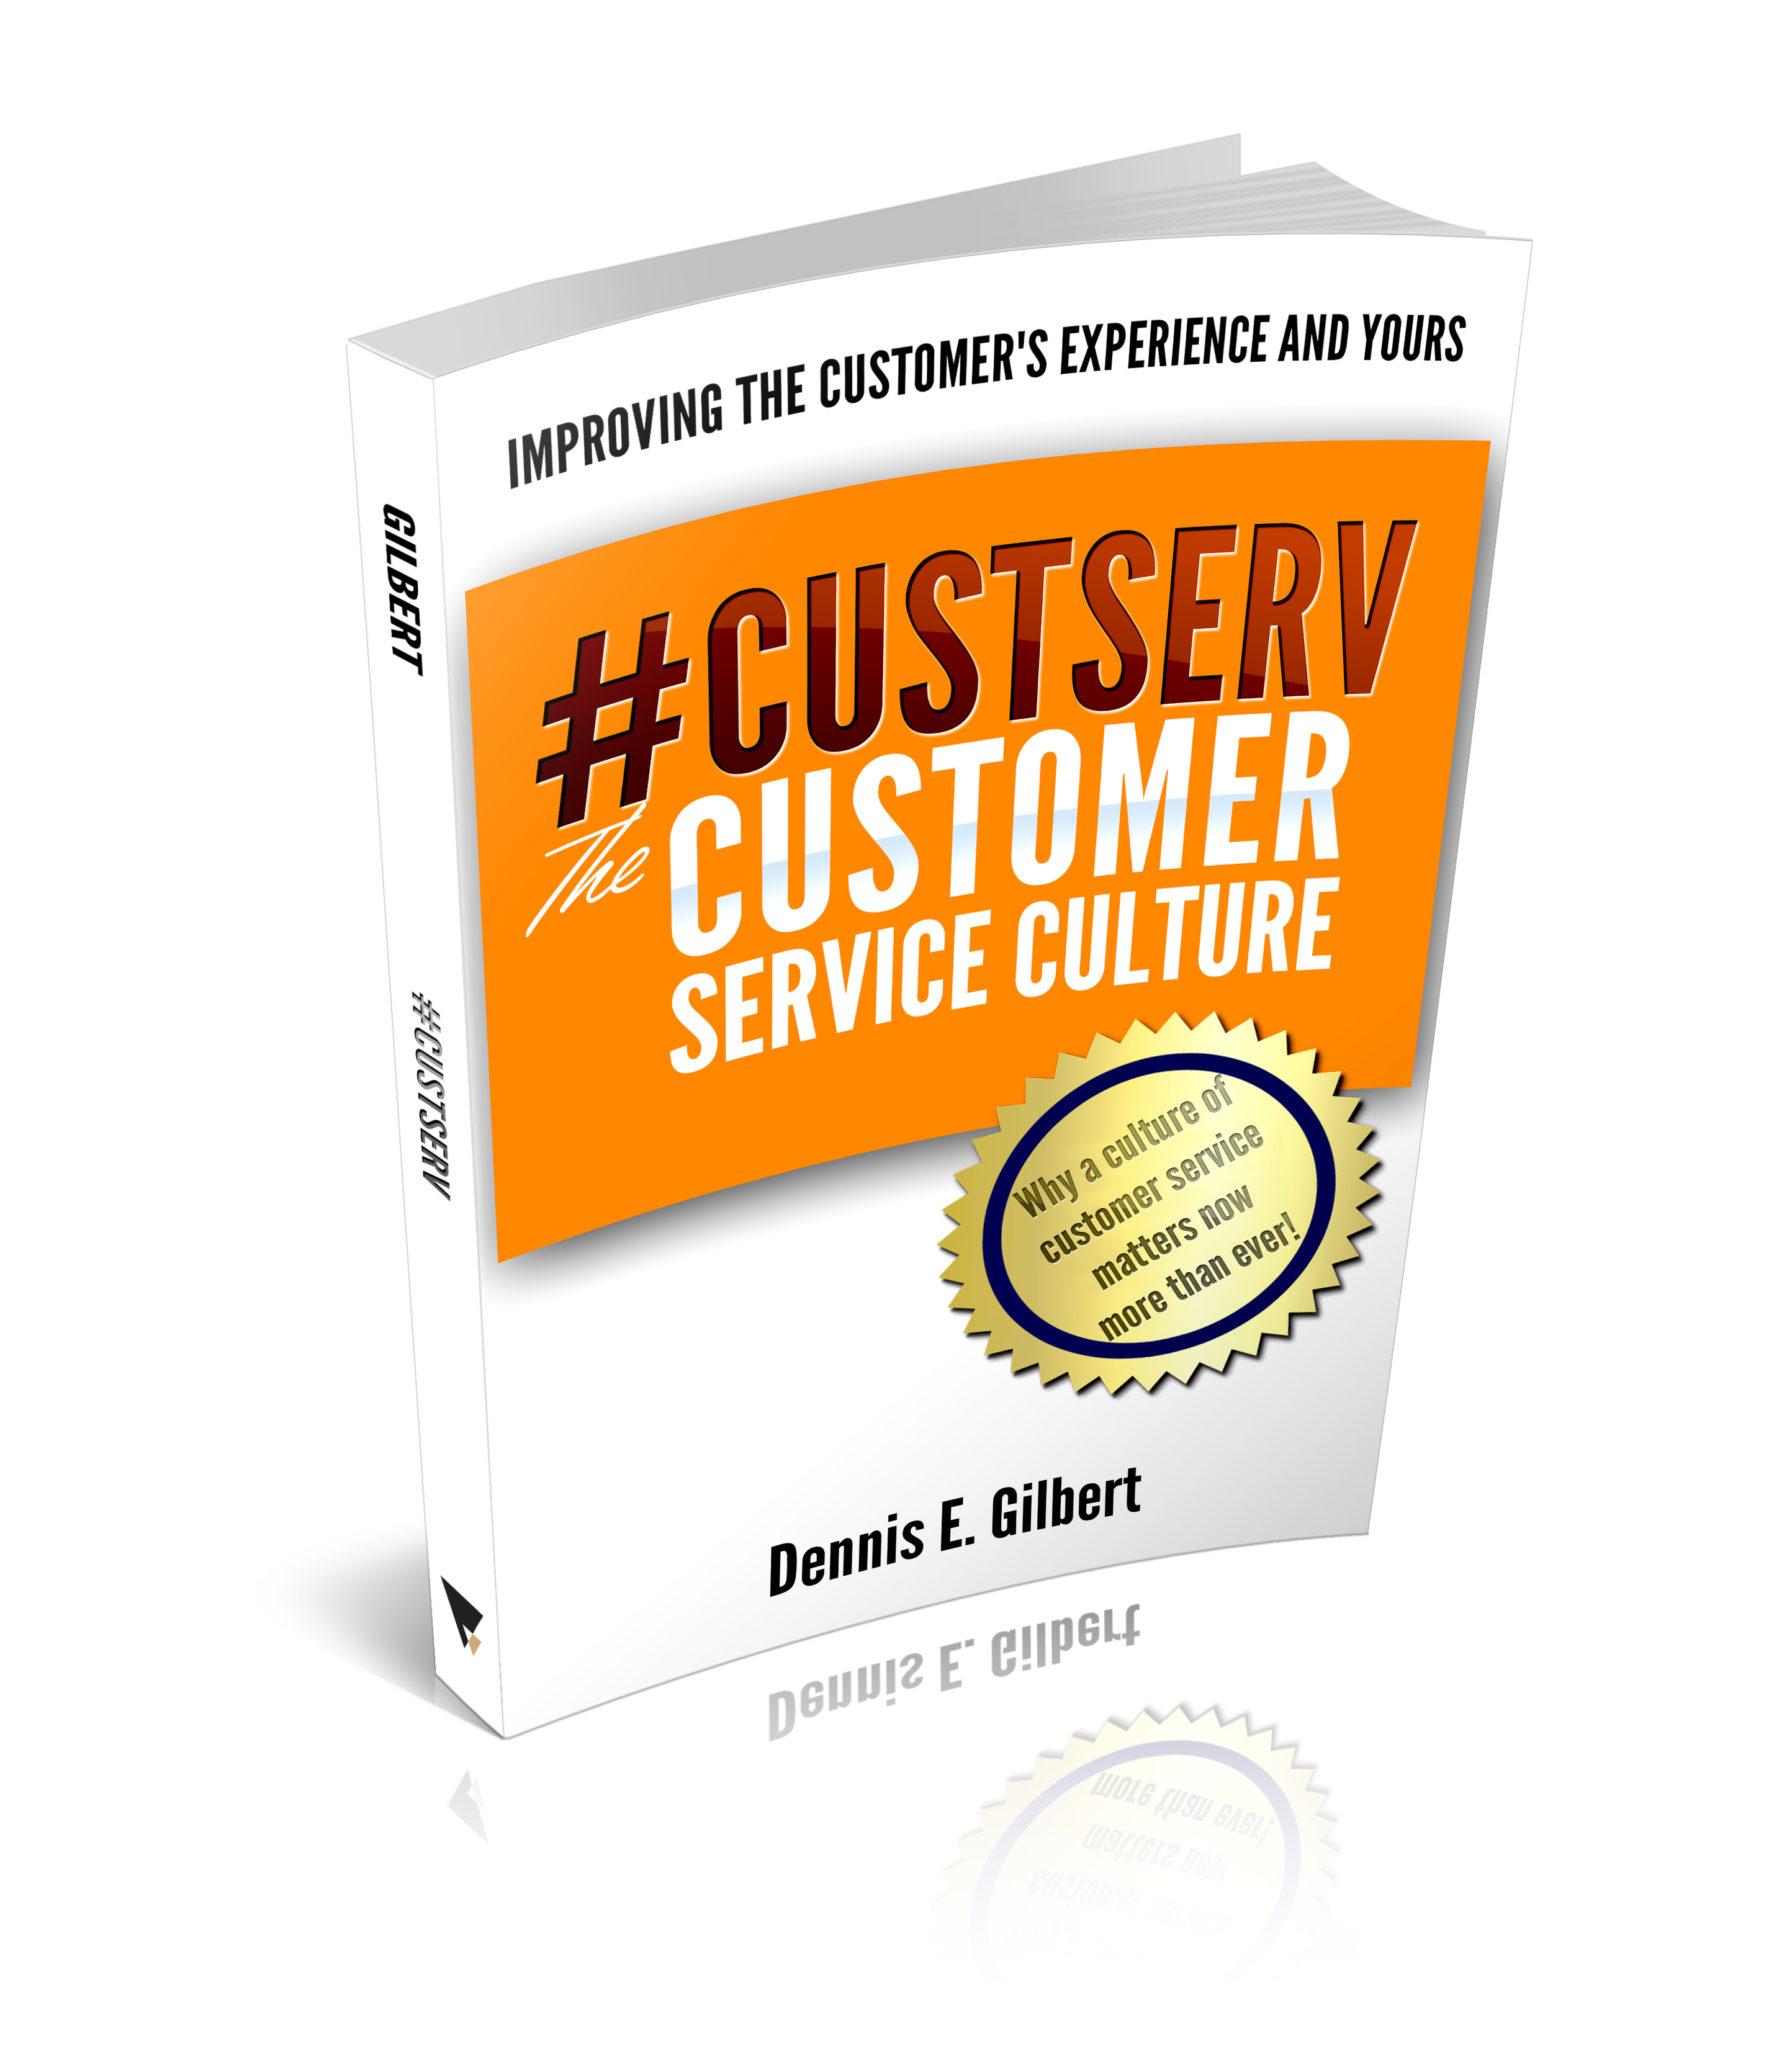 customer service book